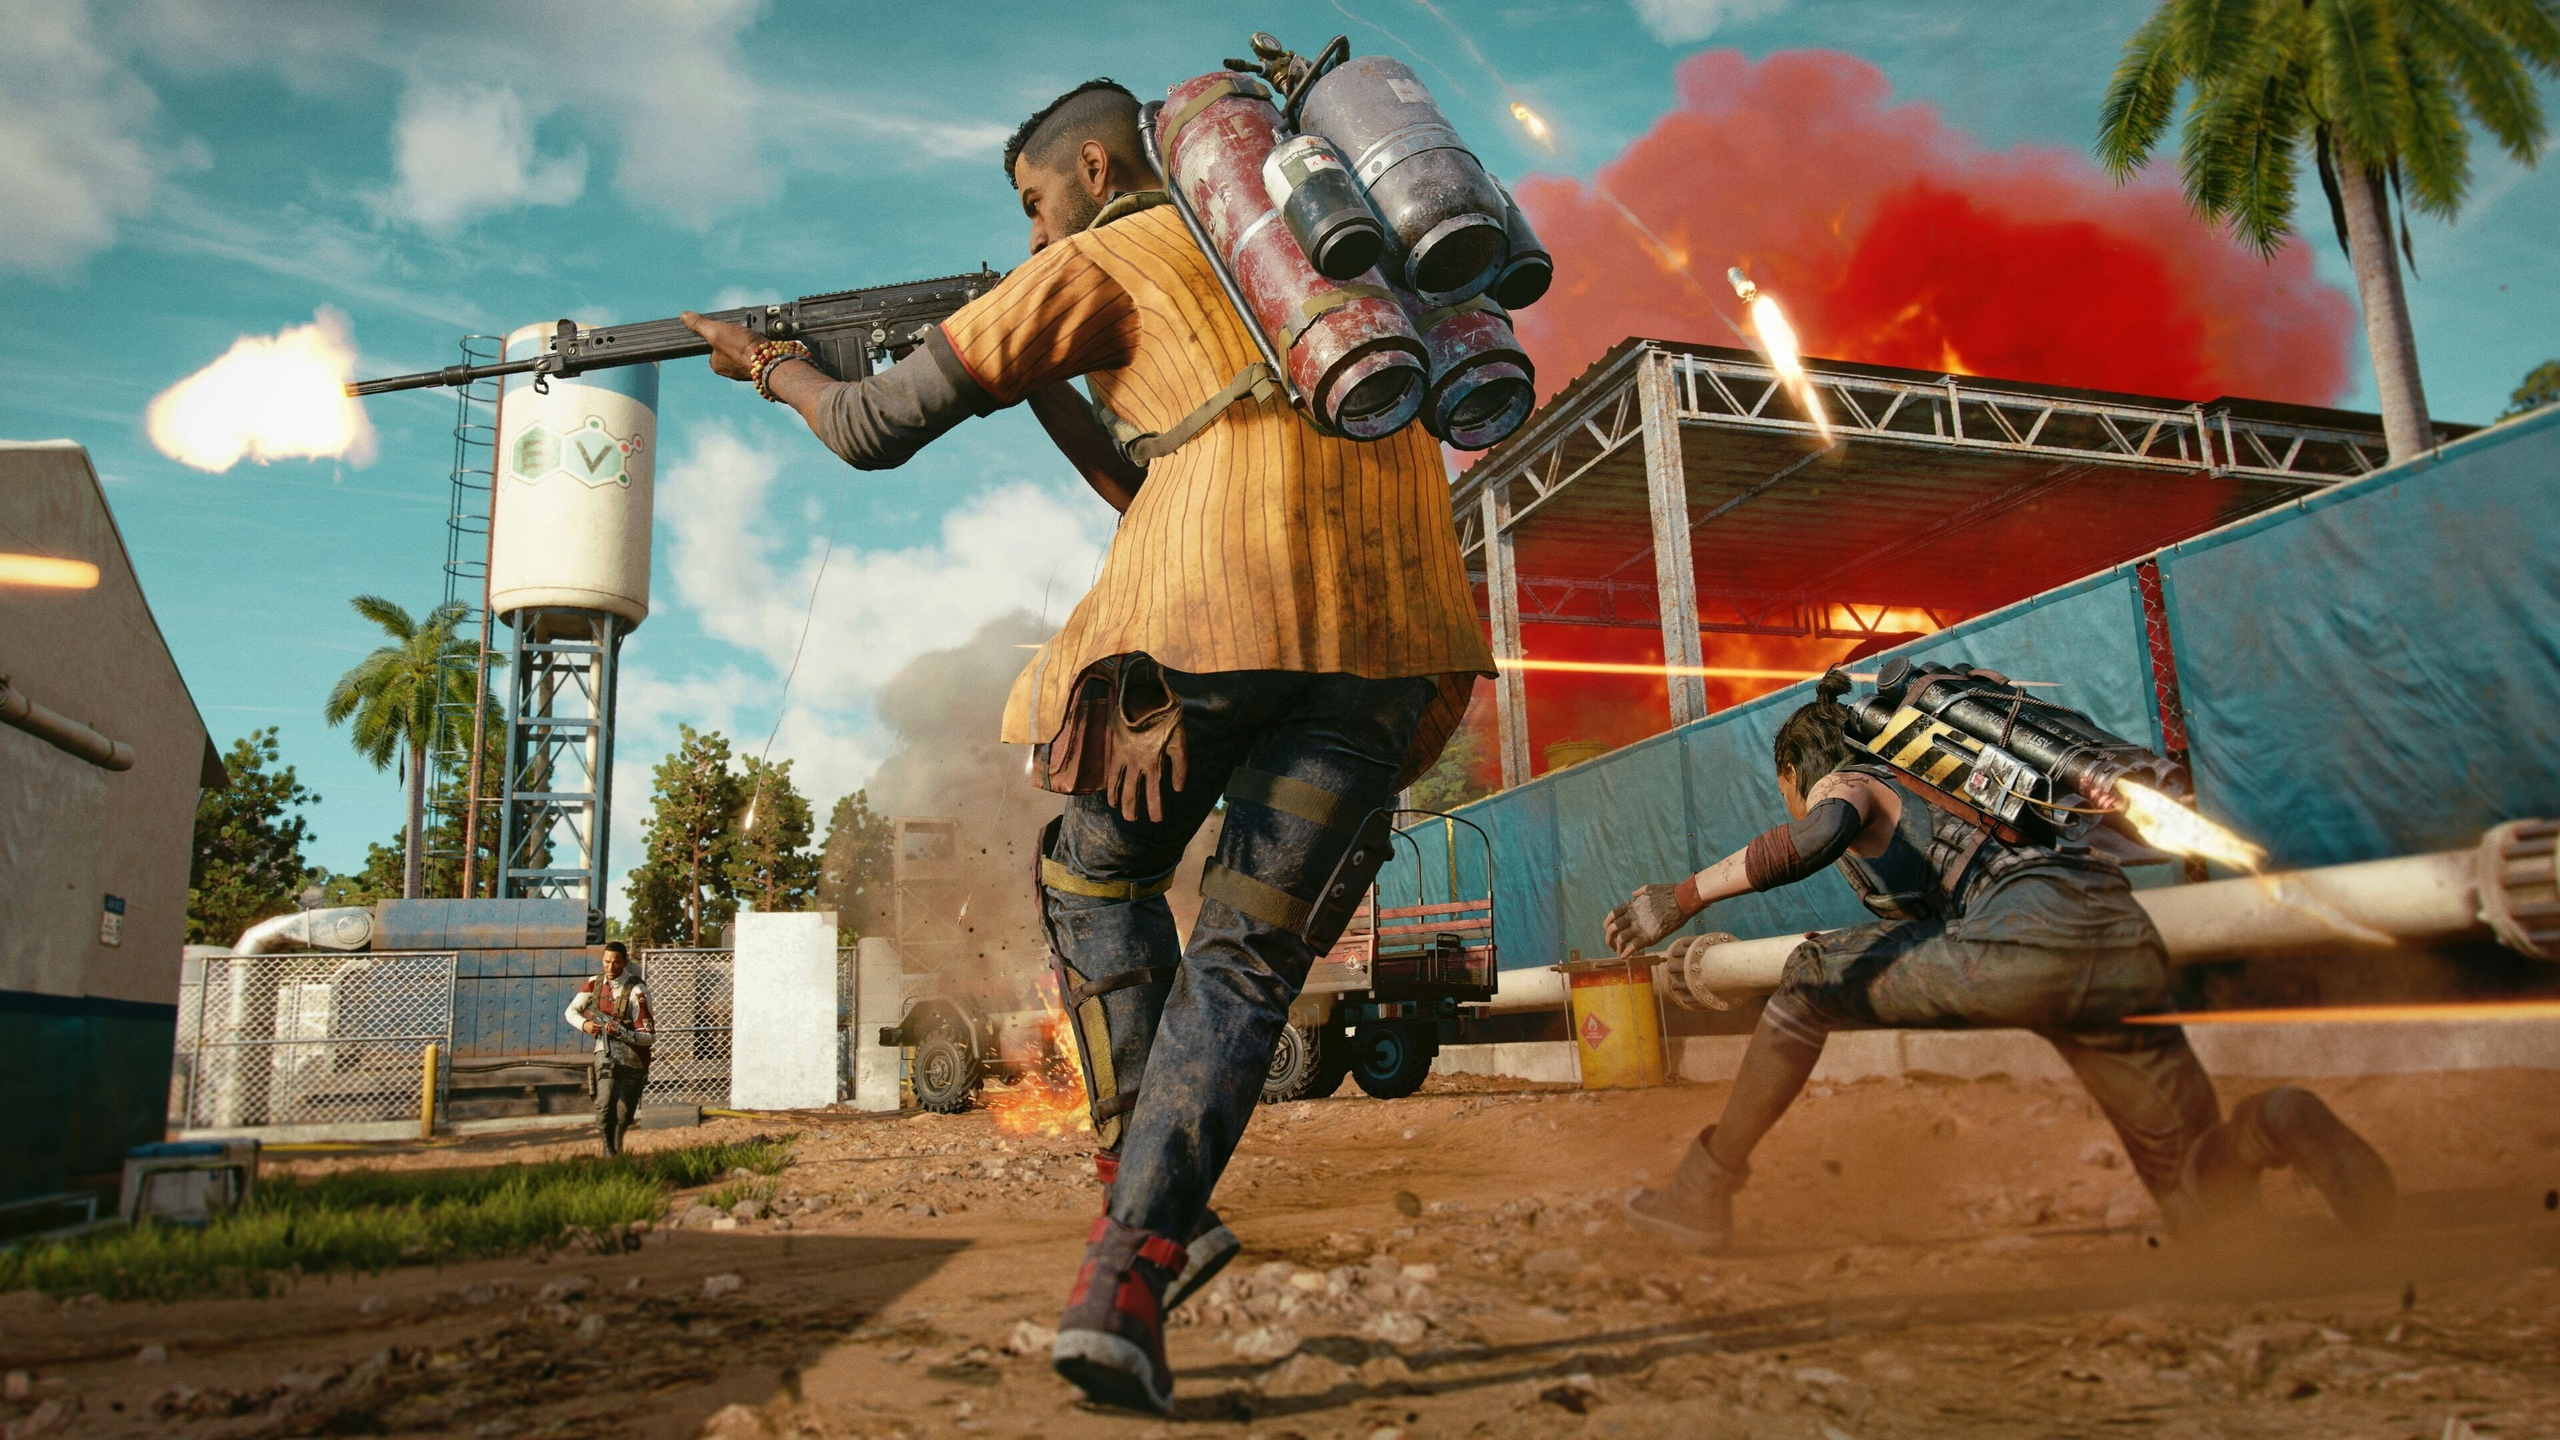 Журналистам дали поиграть в Far Cry 6 около 6 часов